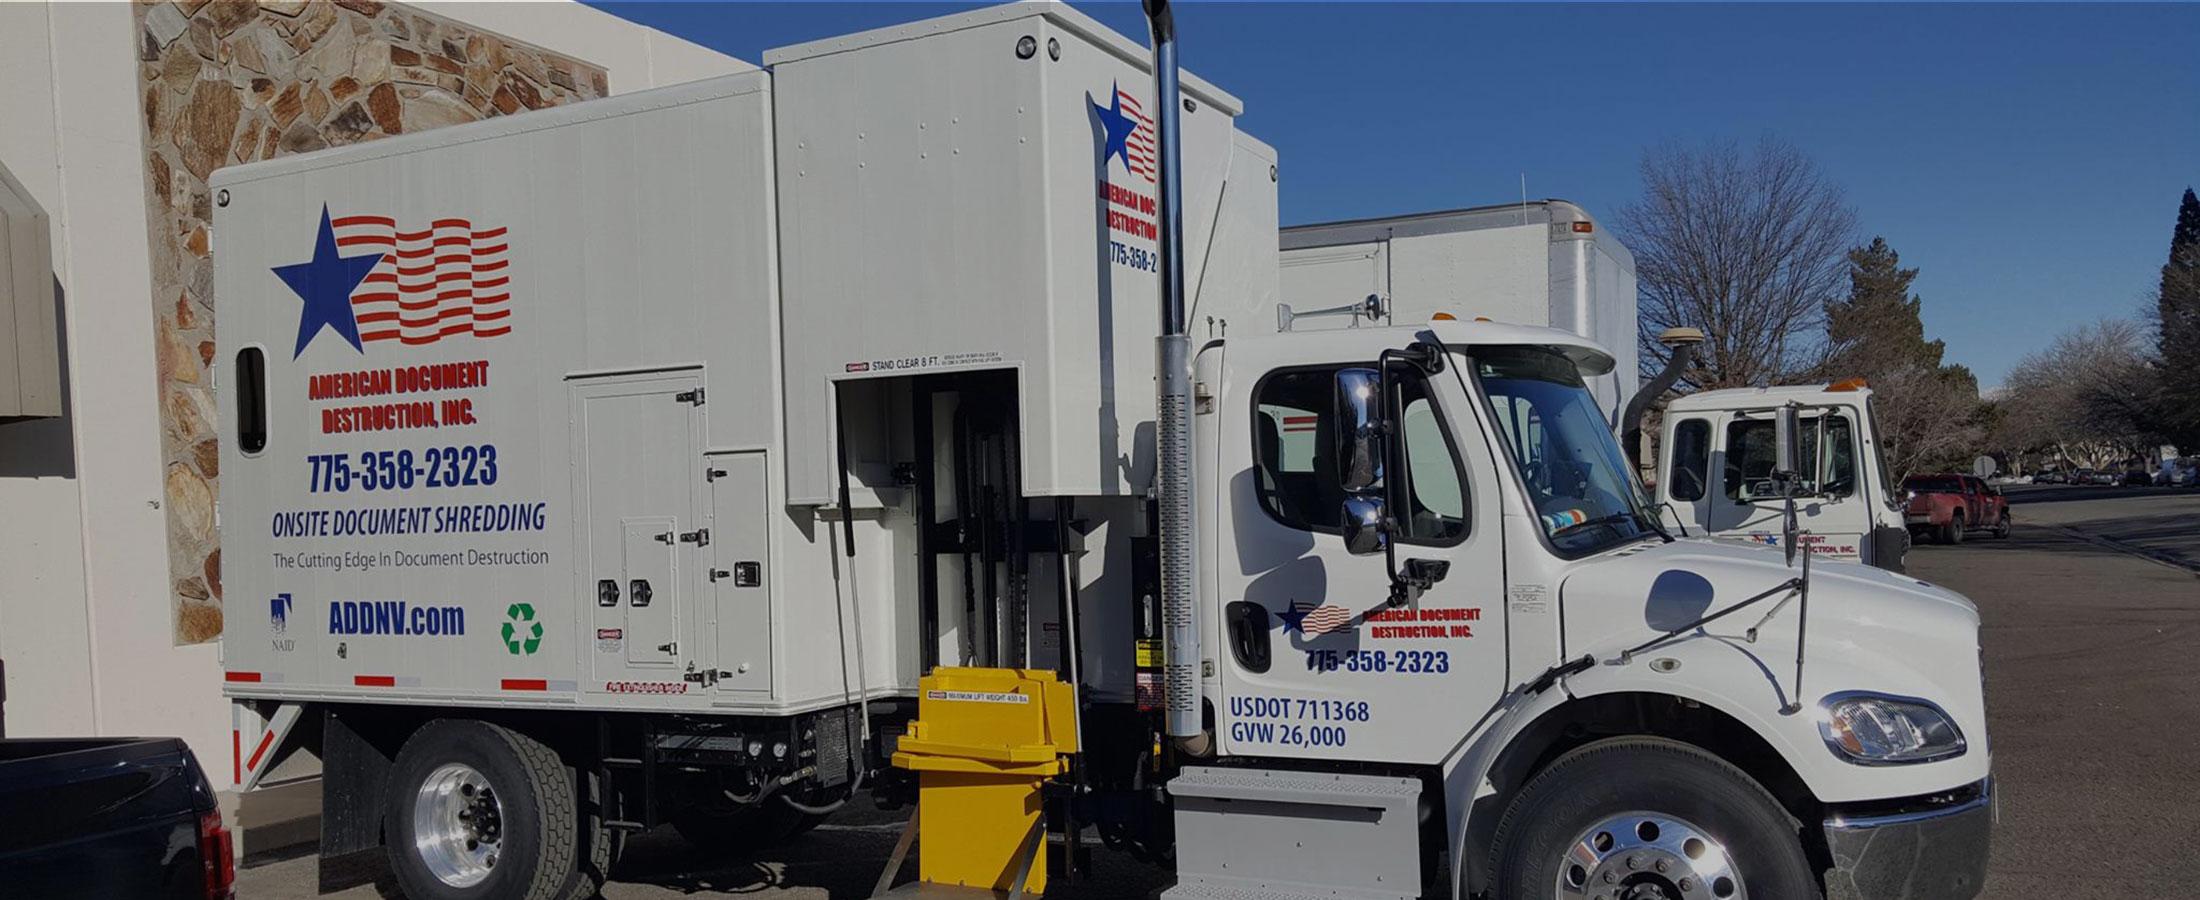 Multiple American Document Destruction trucks parked